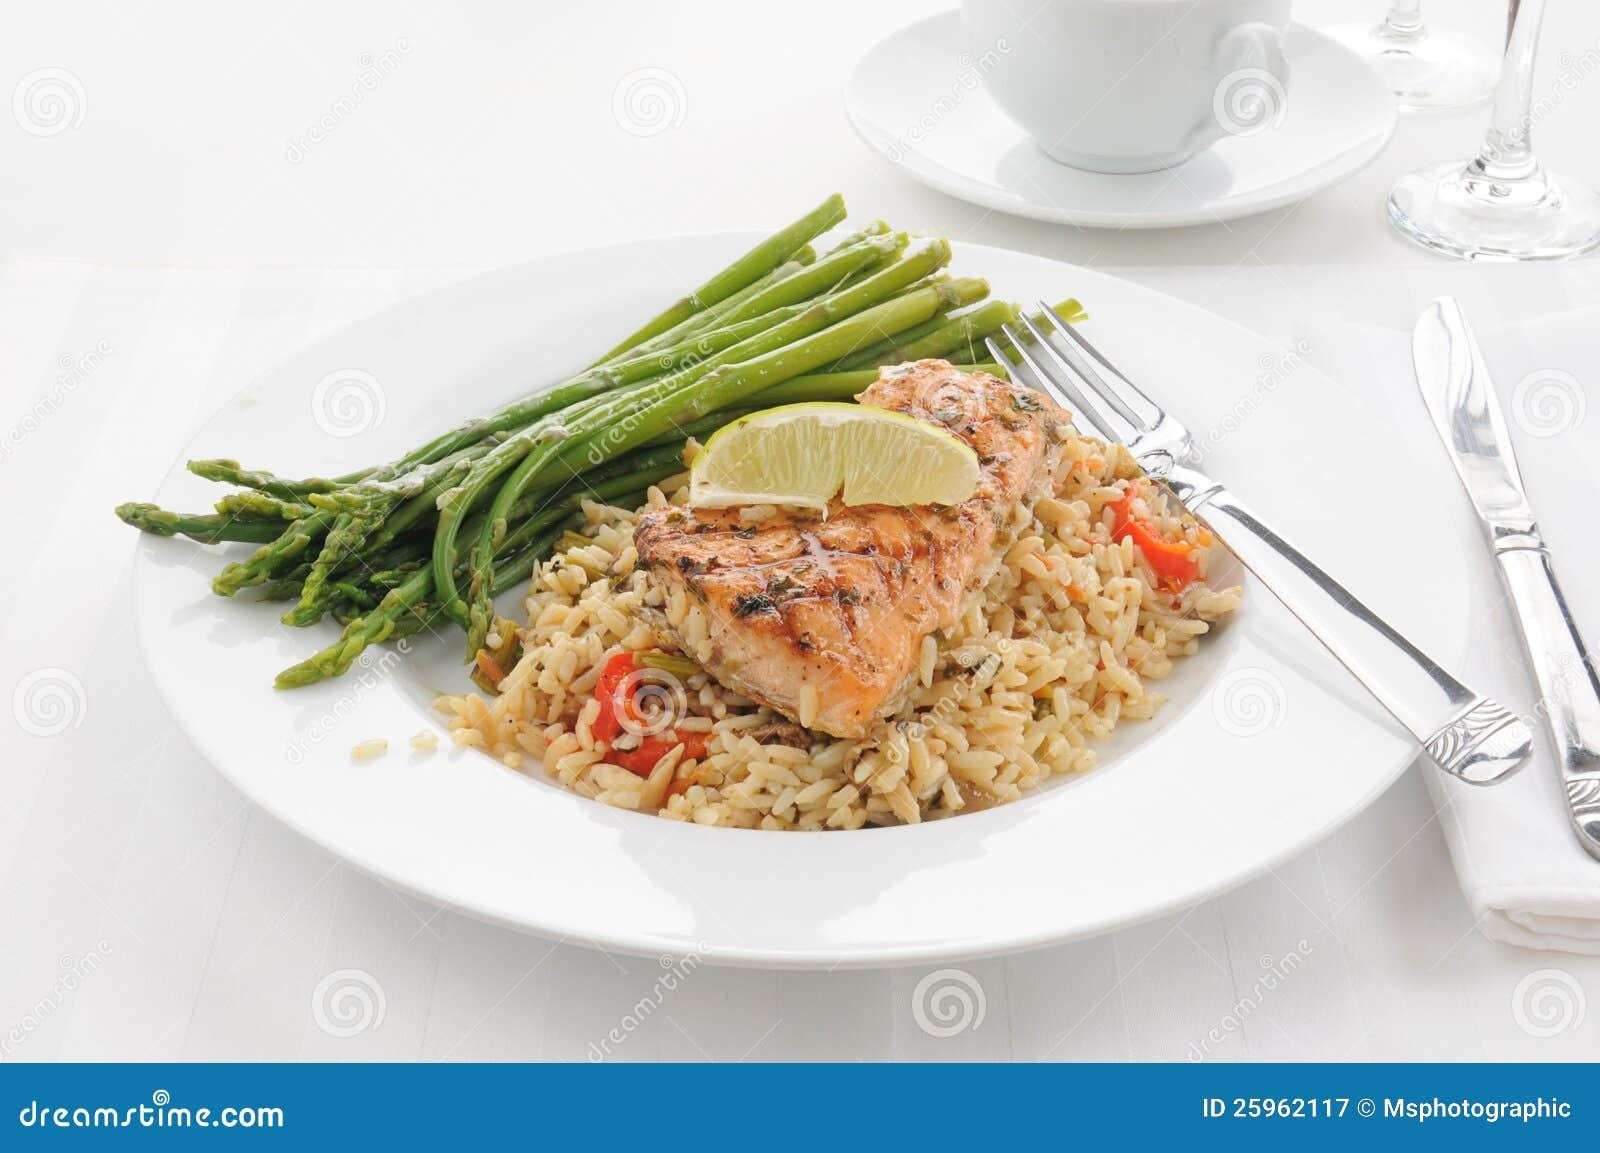 Salmões com arroz